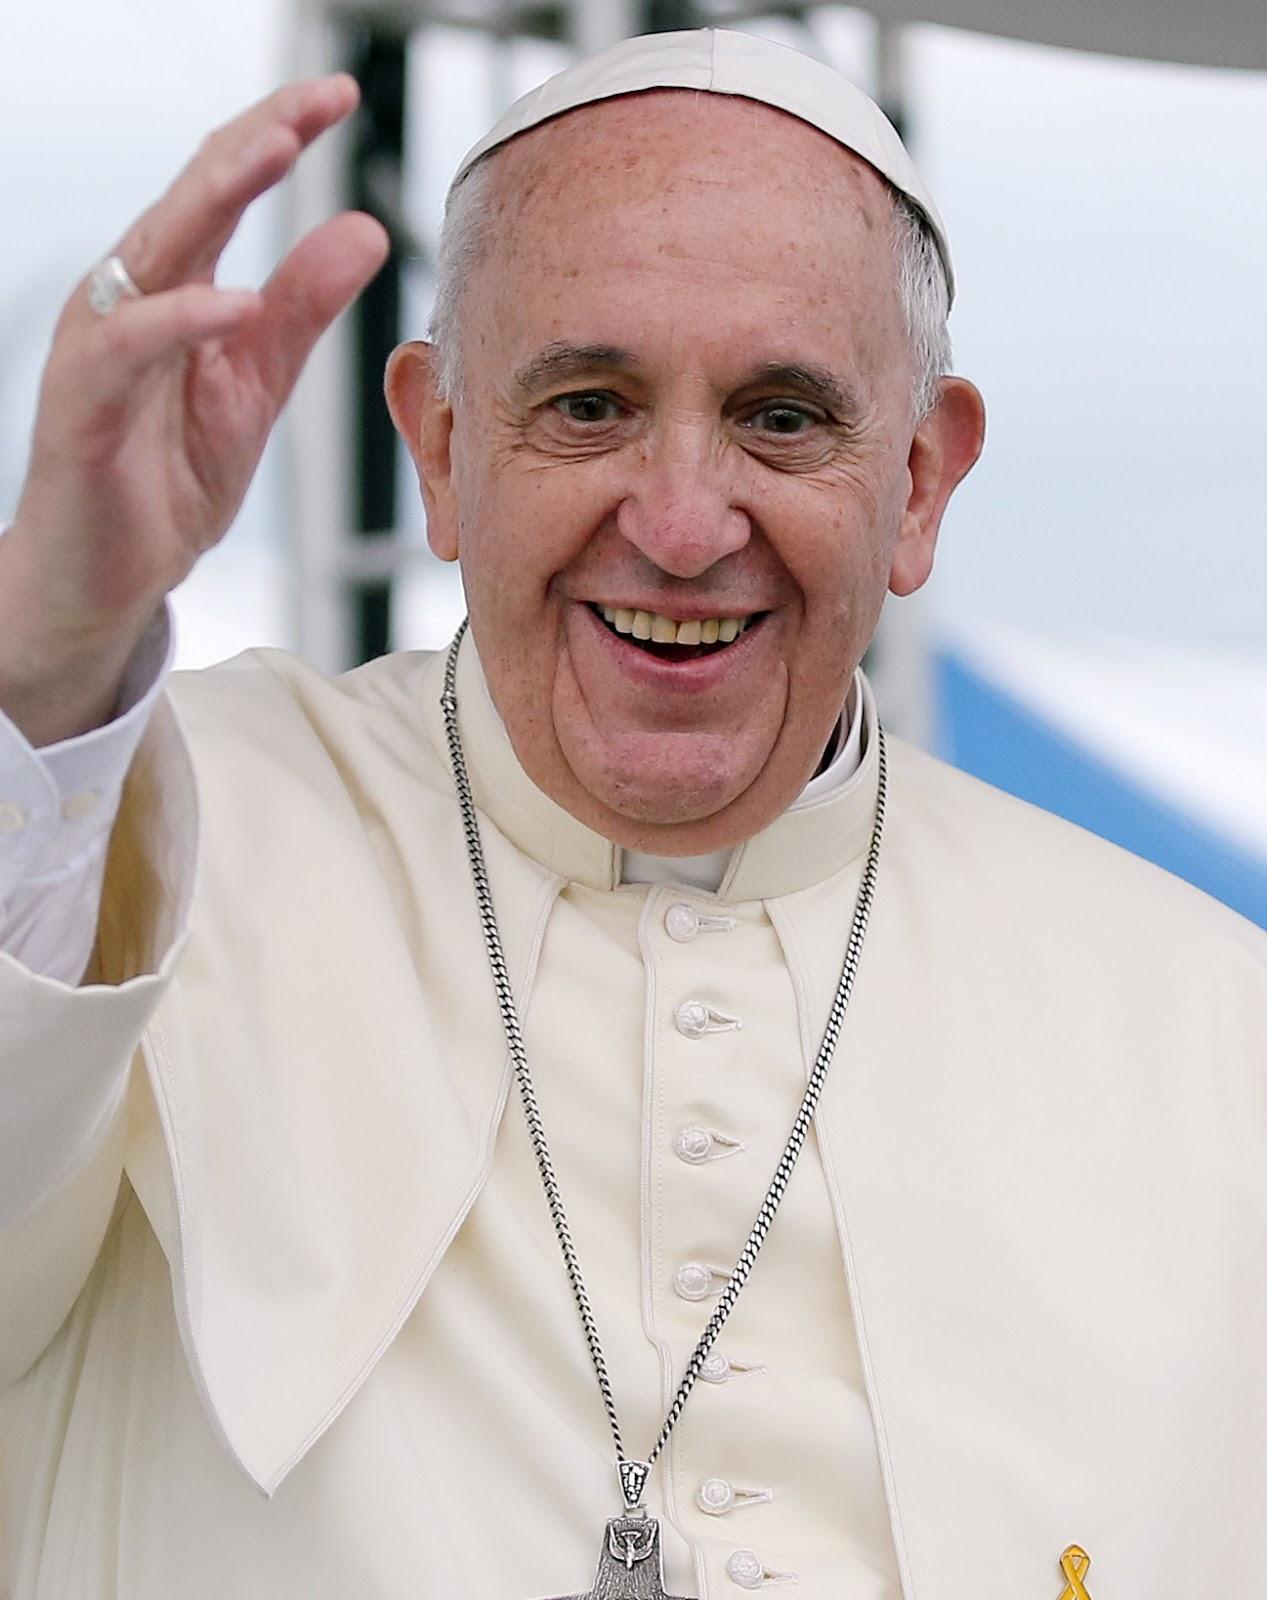 http://4.bp.blogspot.com/-UkTYQI5r8cg/VY4MrrLEcEI/AAAAAAAAOvs/86wHOTlANMA/s1600/Pope_Francis_Korea.jpg